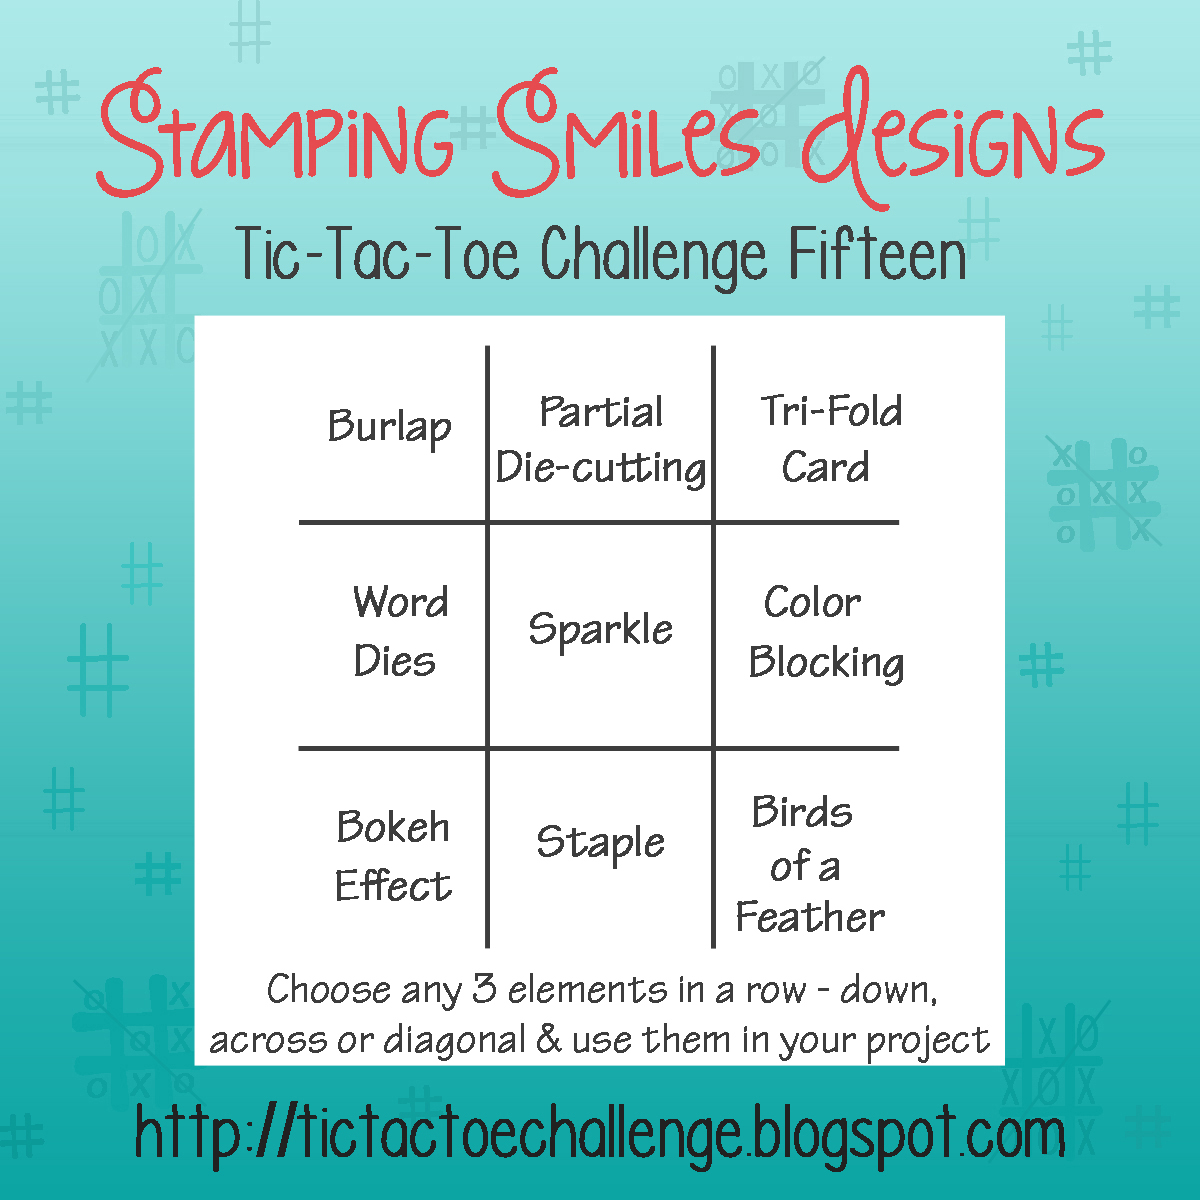 Tic Tac Toe Challenge Challenge 15 Inspiration With Rachel